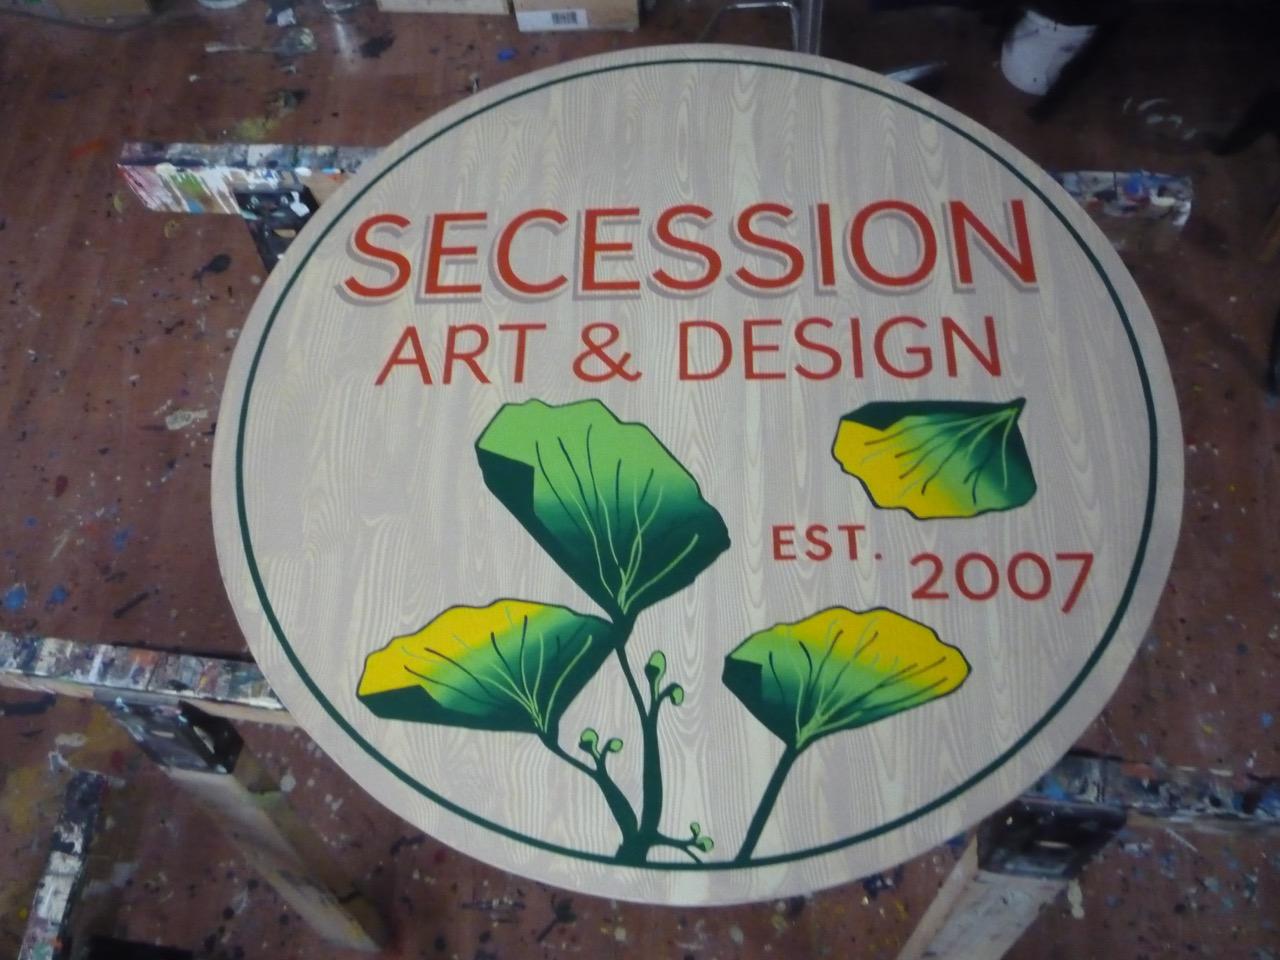 WOOD-faux-wood-grain-sucession_23891071866_o.jpg